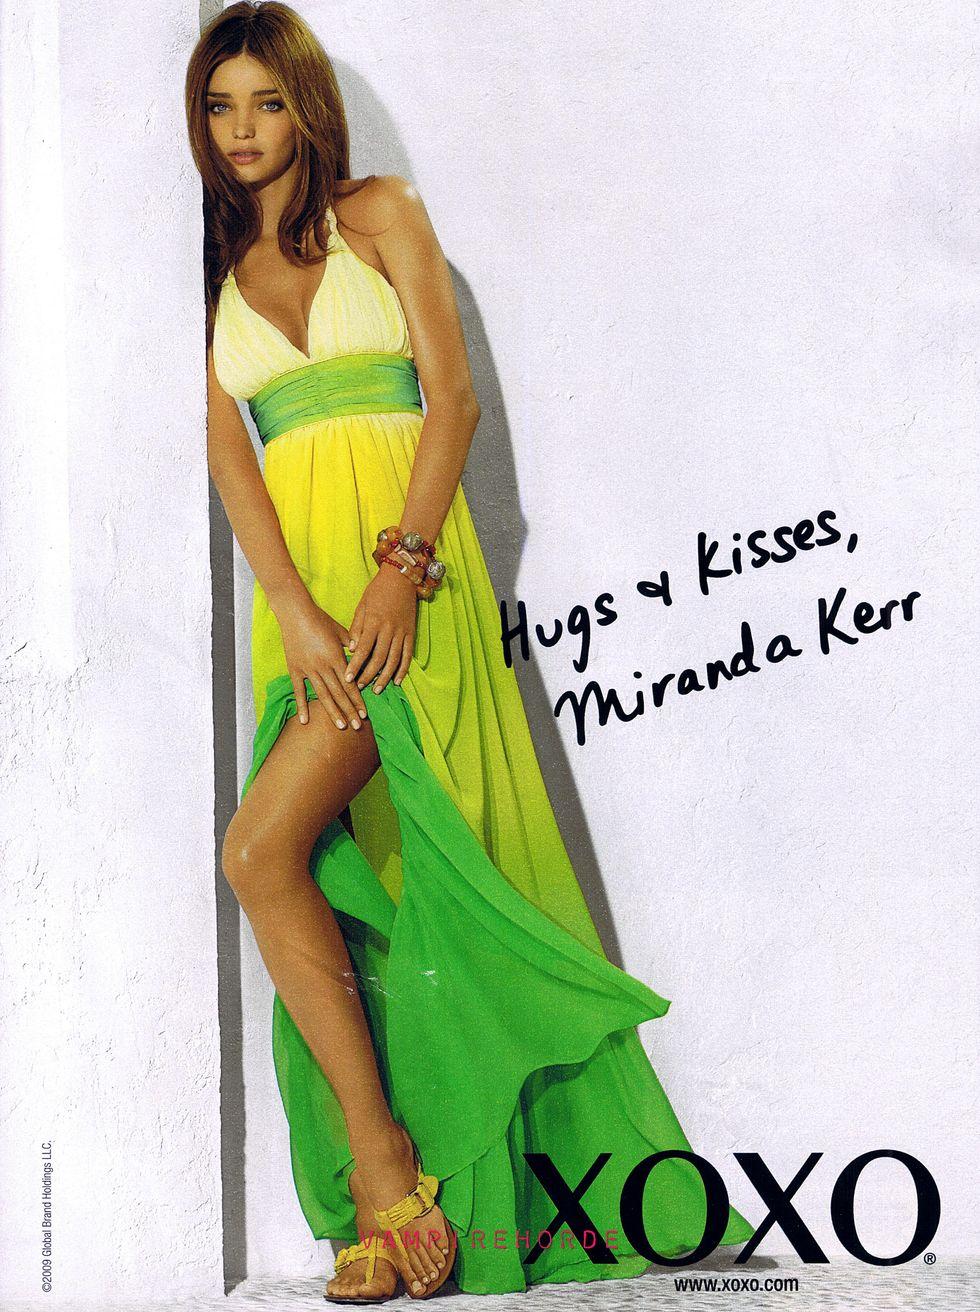 miranda-kerr-xoxo-spring-summer-2009-campaign-2-01